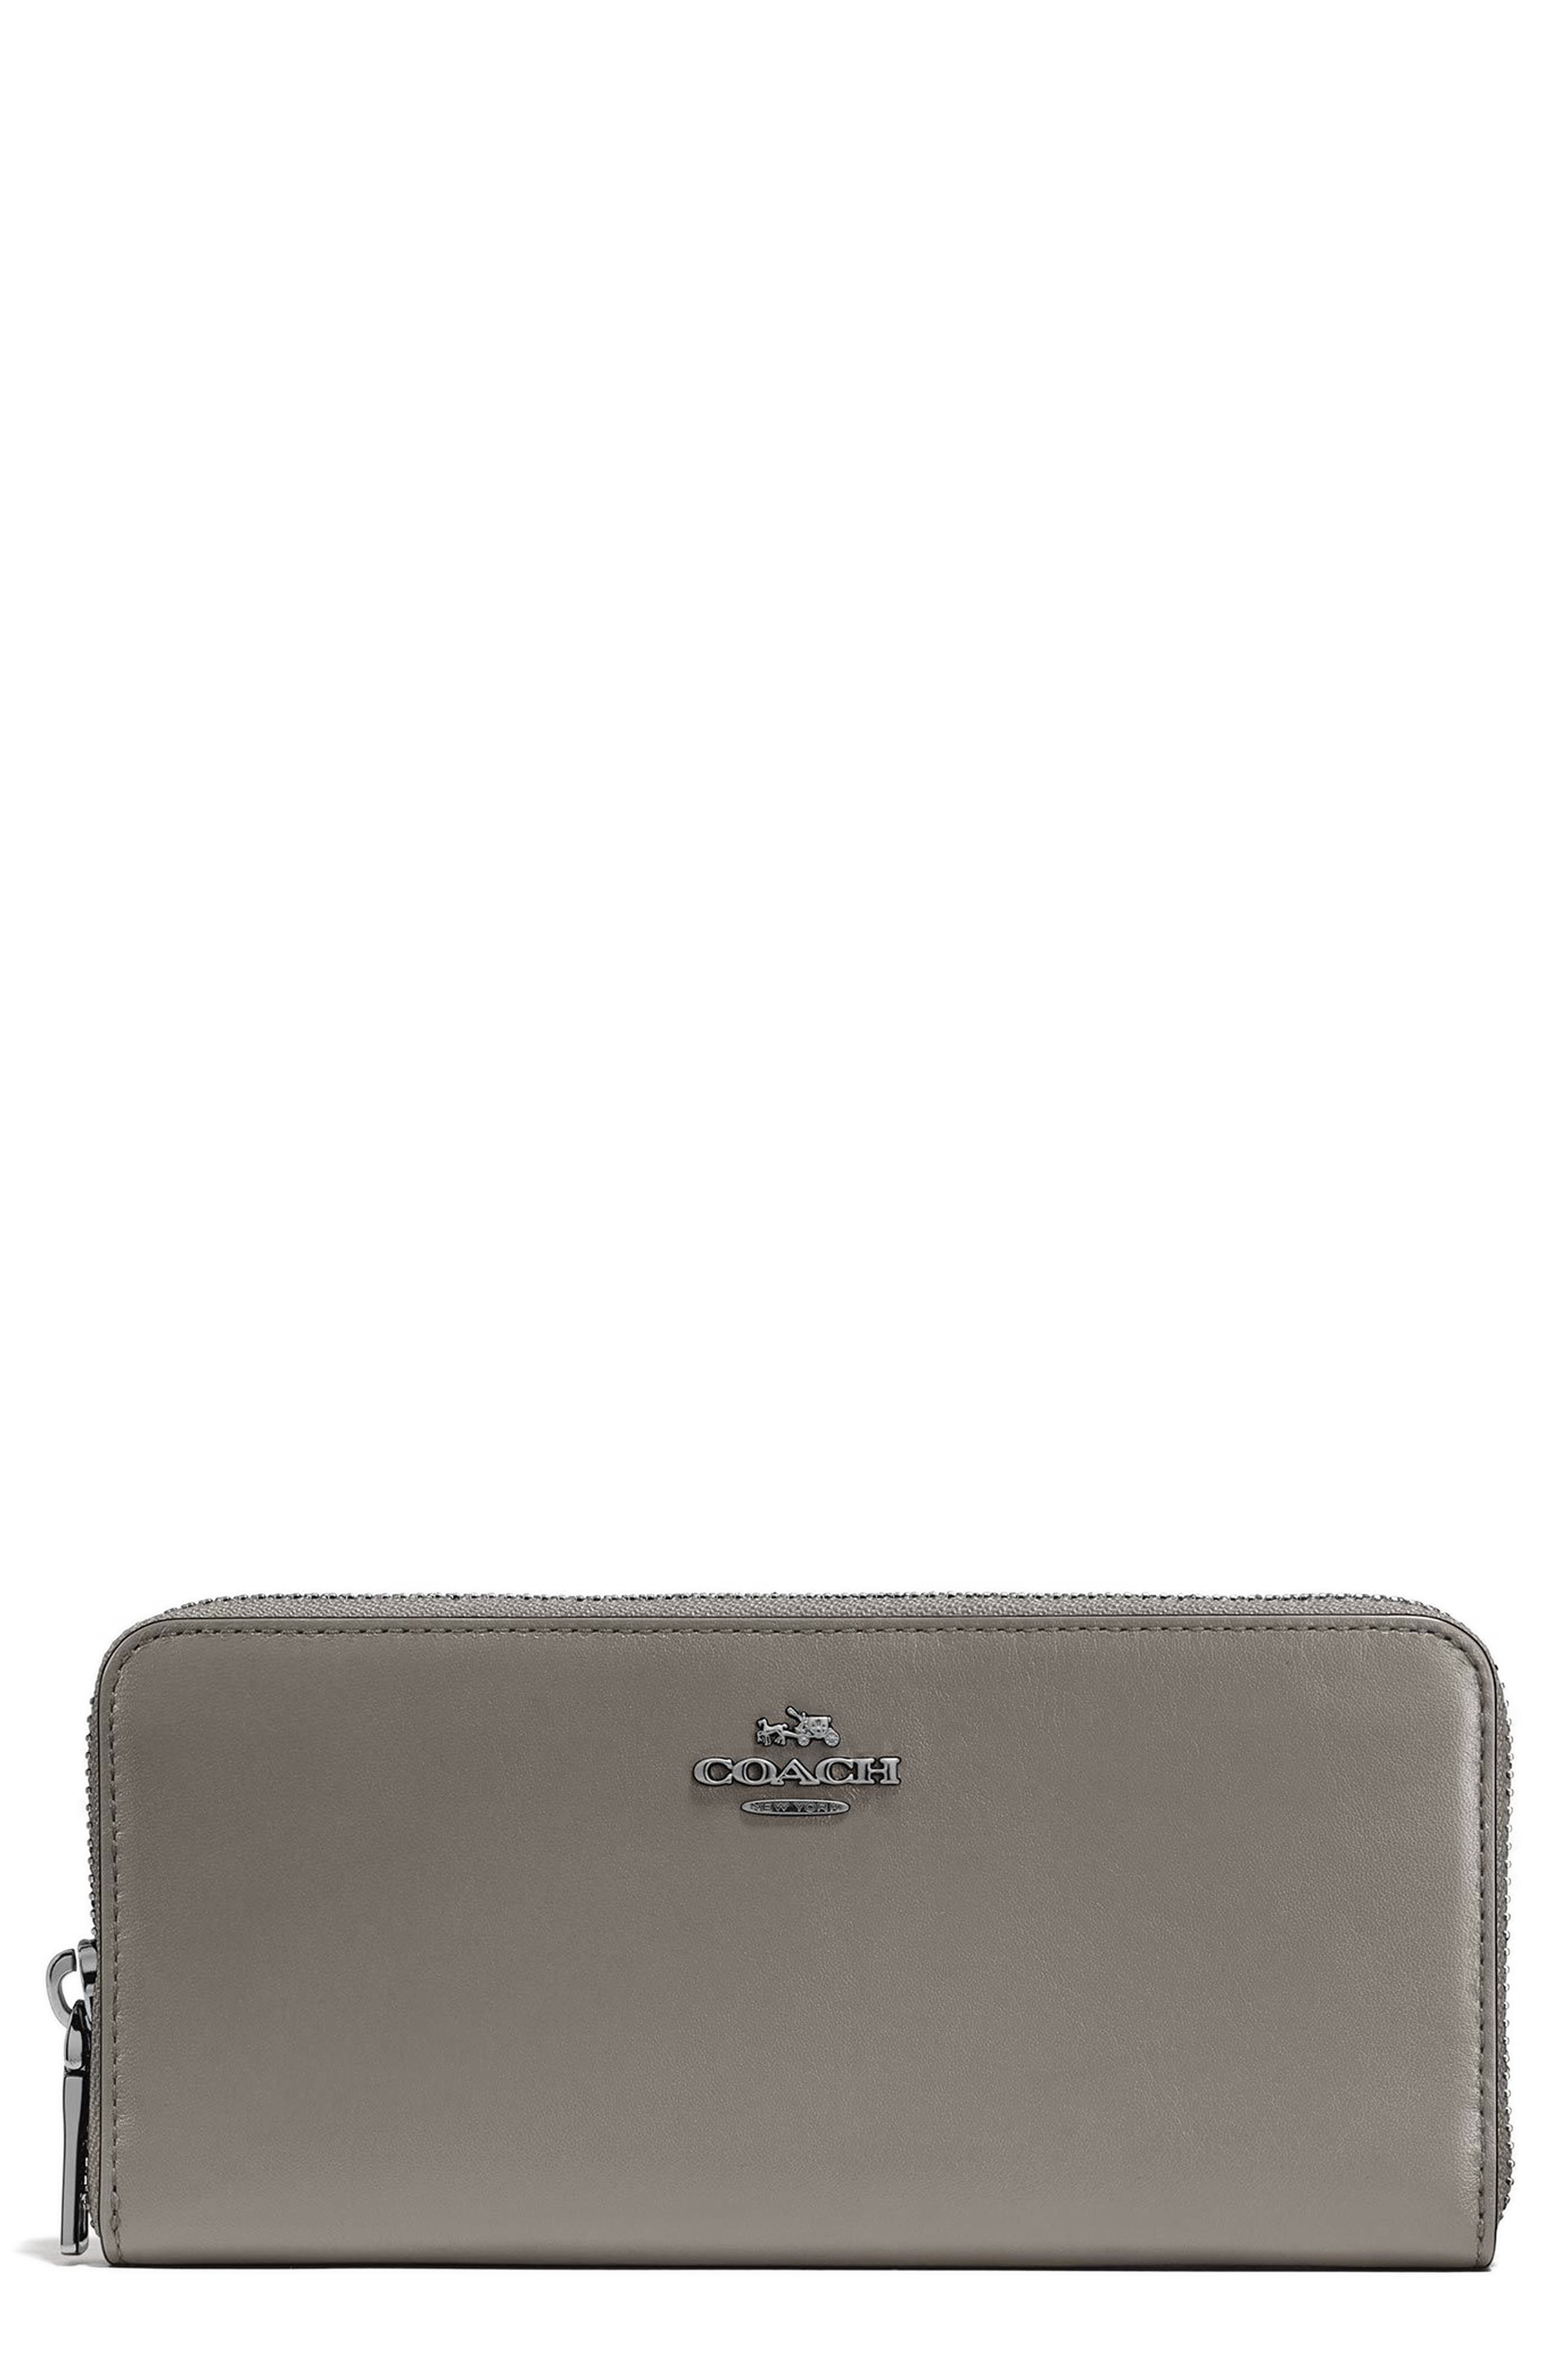 COACH Accordion Zip Around Leather Wallet